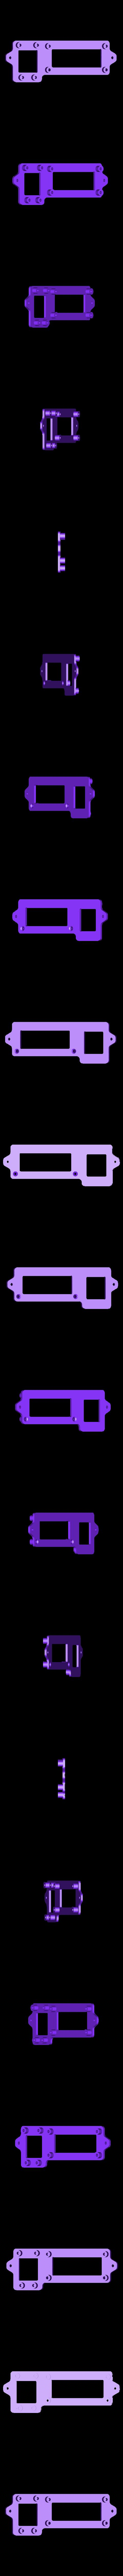 boomypi-mount-plate.stl Download free STL file Raspberry Pi Airplay BoomBox • 3D printer template, Adafruit